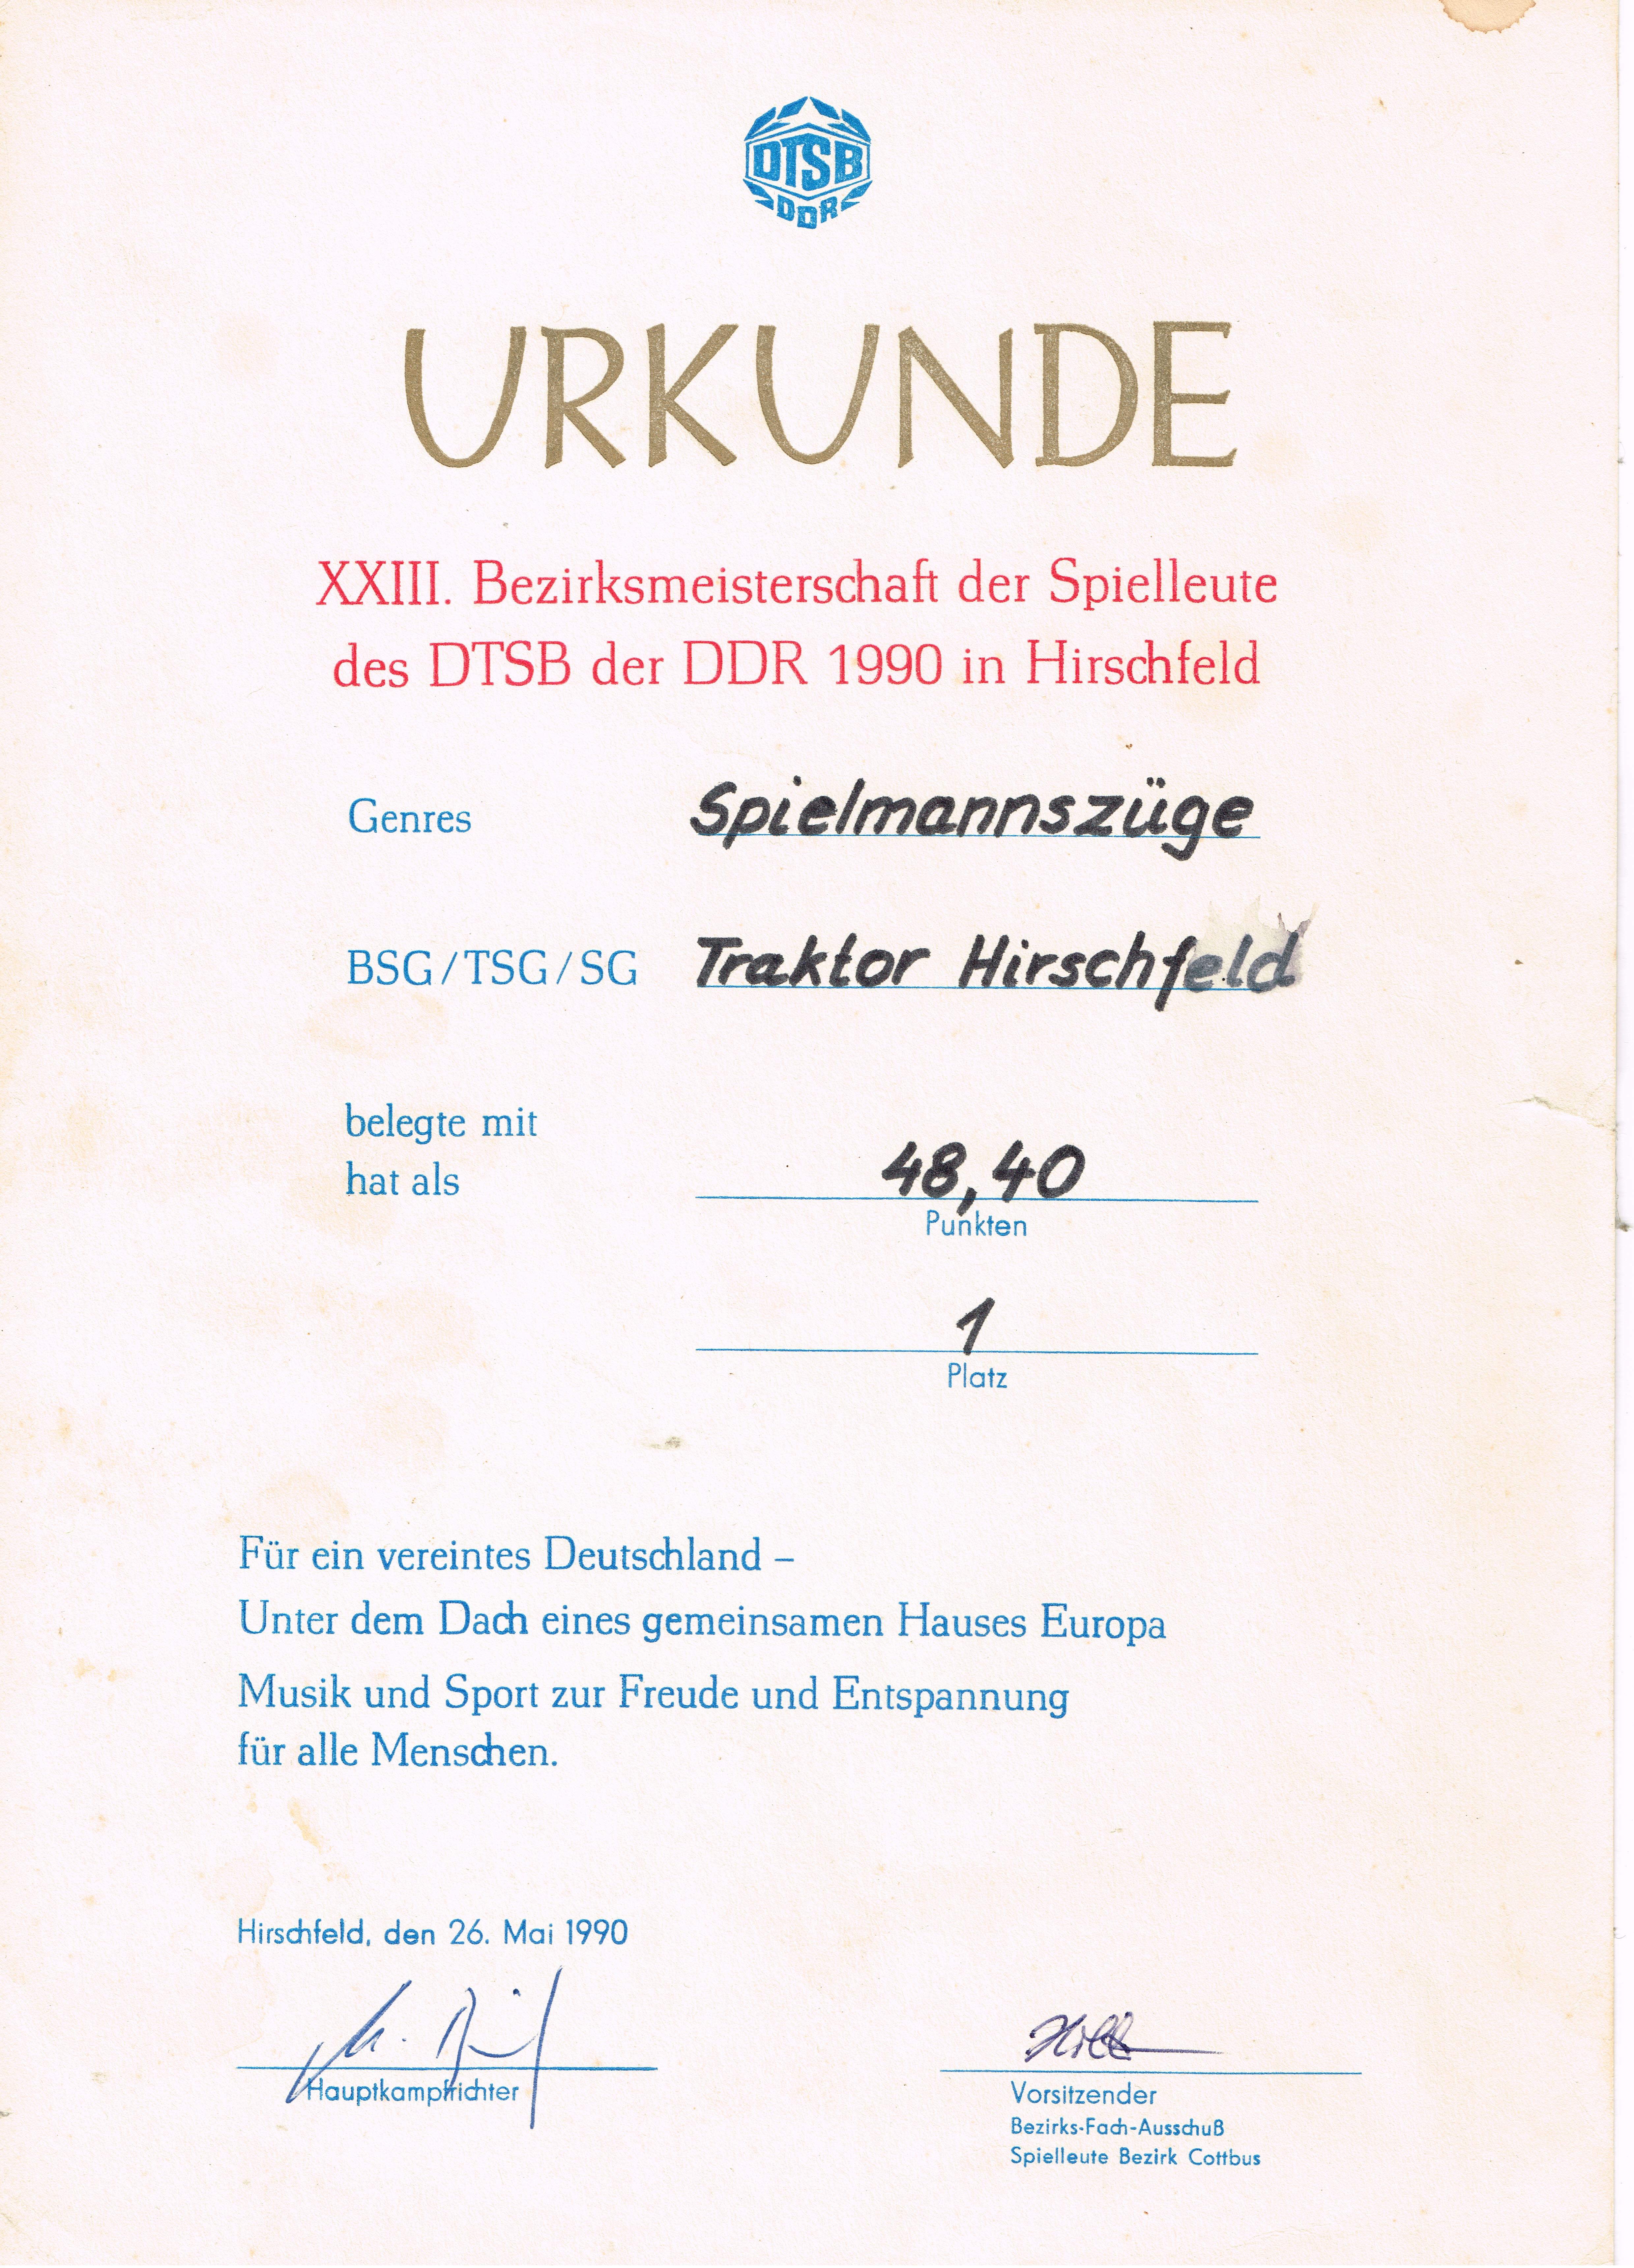 1990 Bezirksmeisterschaft Erwachsene 1990 Hirschfeld